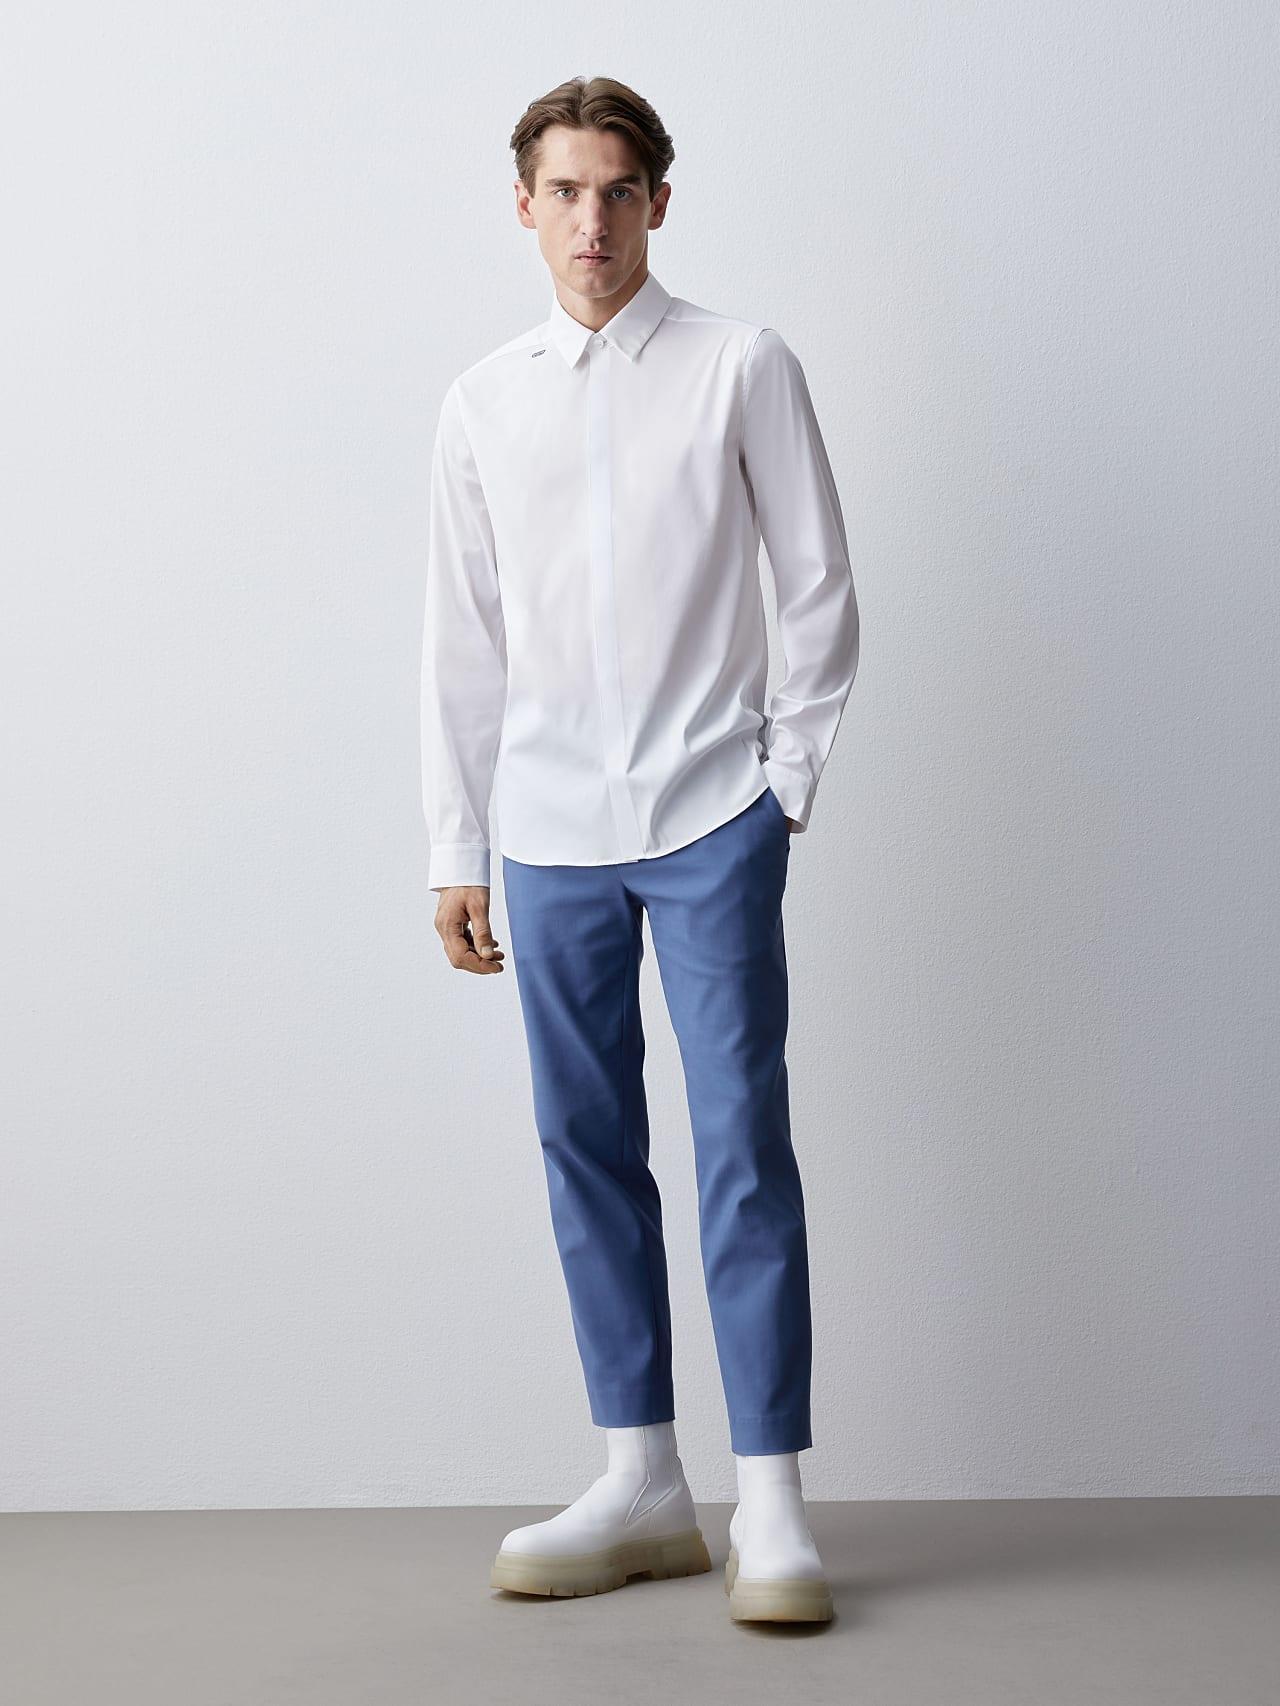 WAMNE V1.Y5.02 Easy-Care Shirt white Front Alpha Tauri